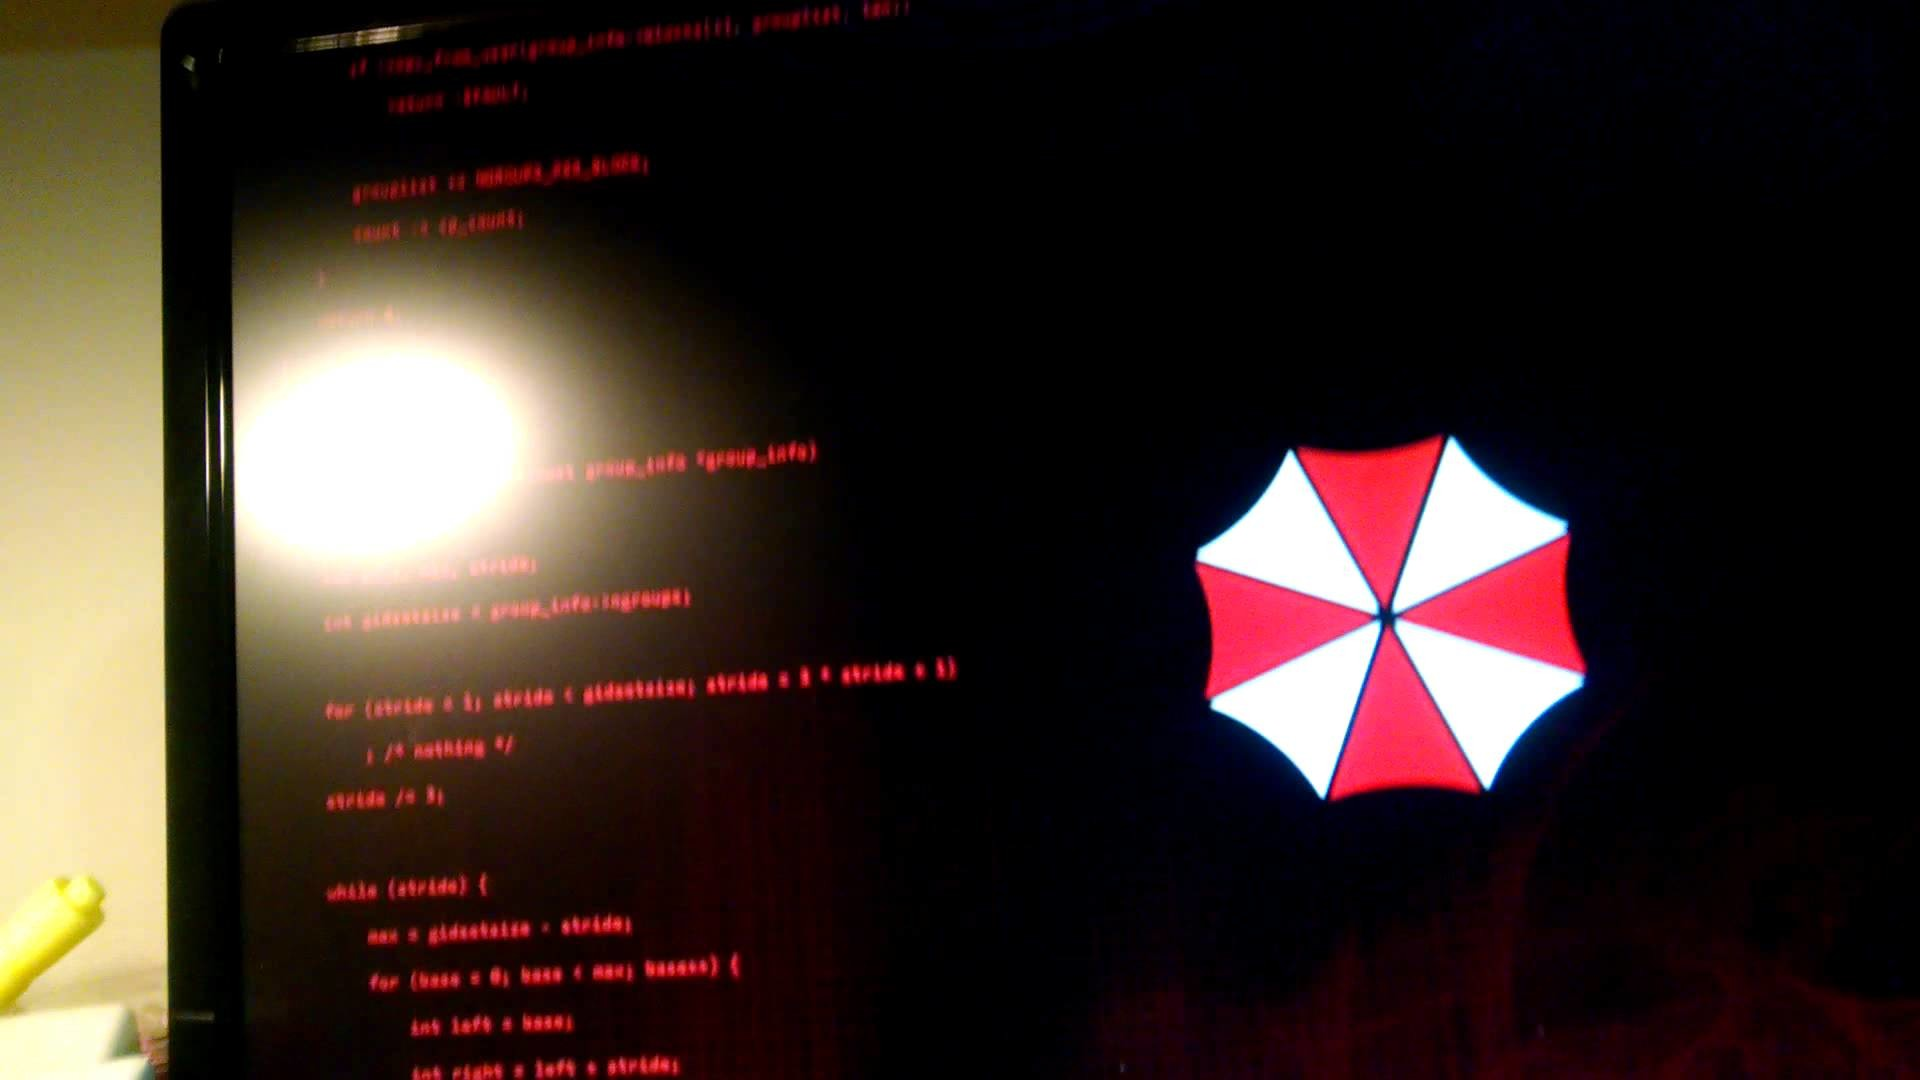 Hacking the Umbrella Corp.